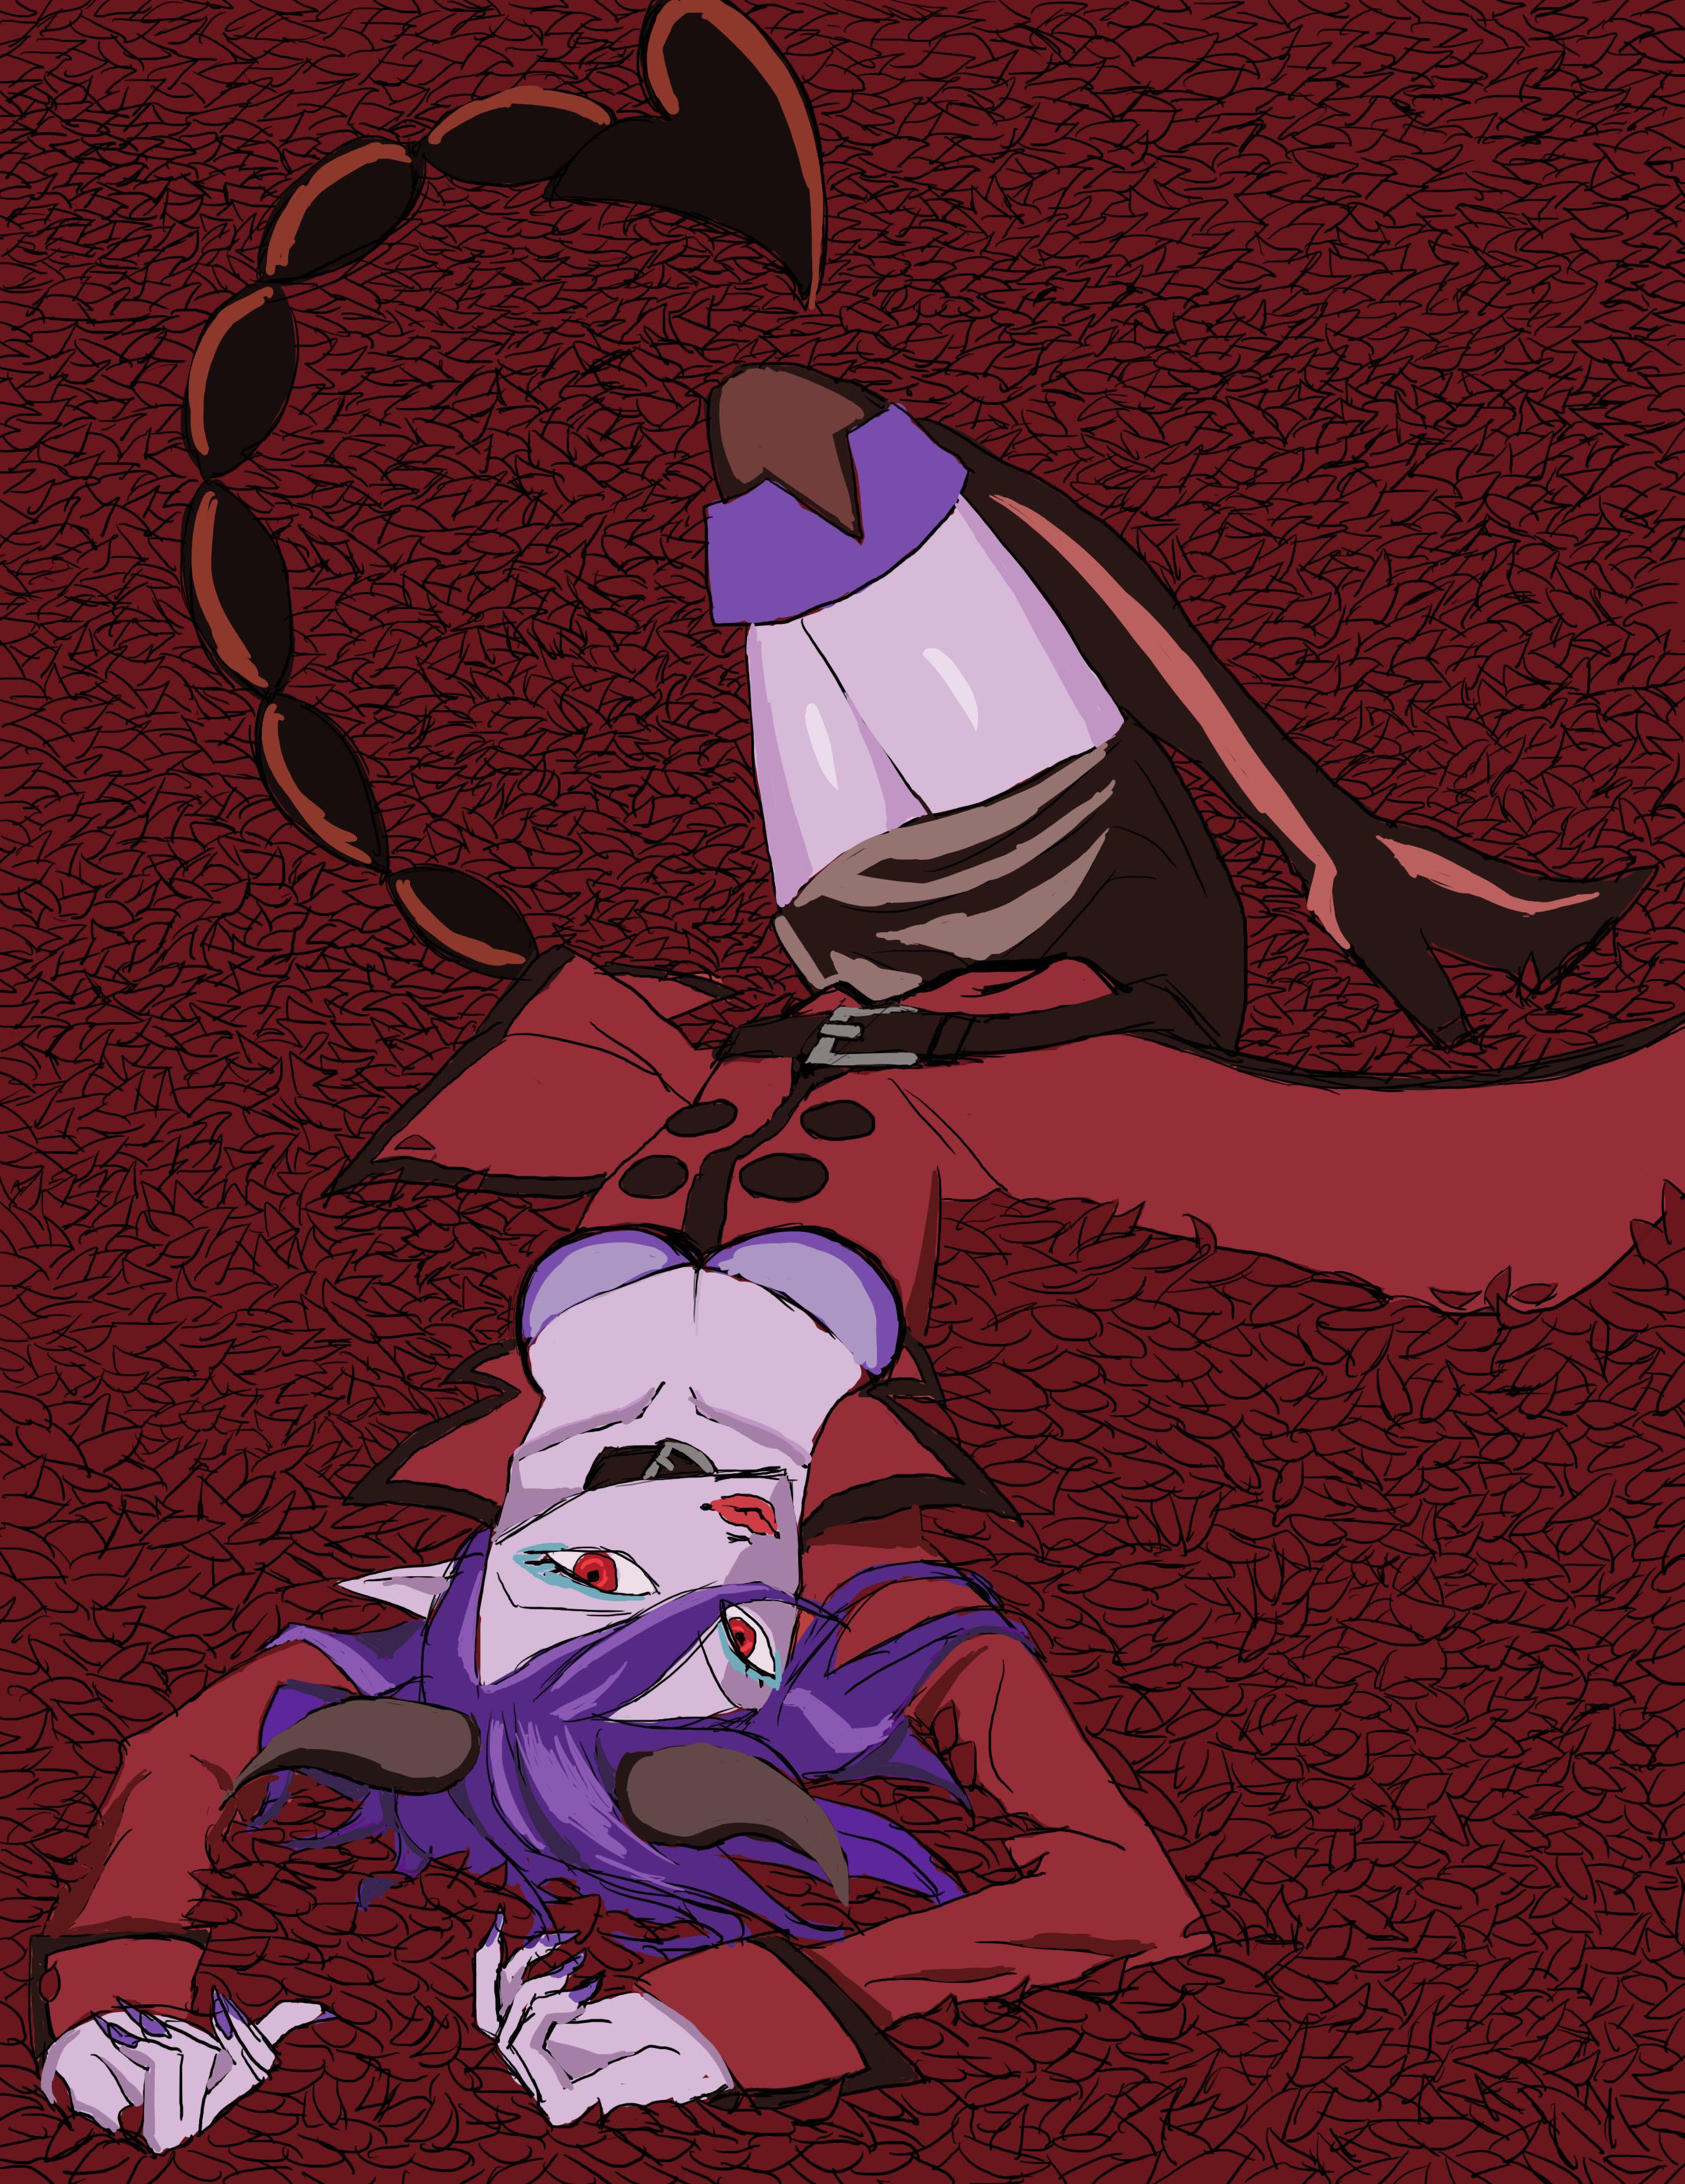 Shindoine from Pretty Cure